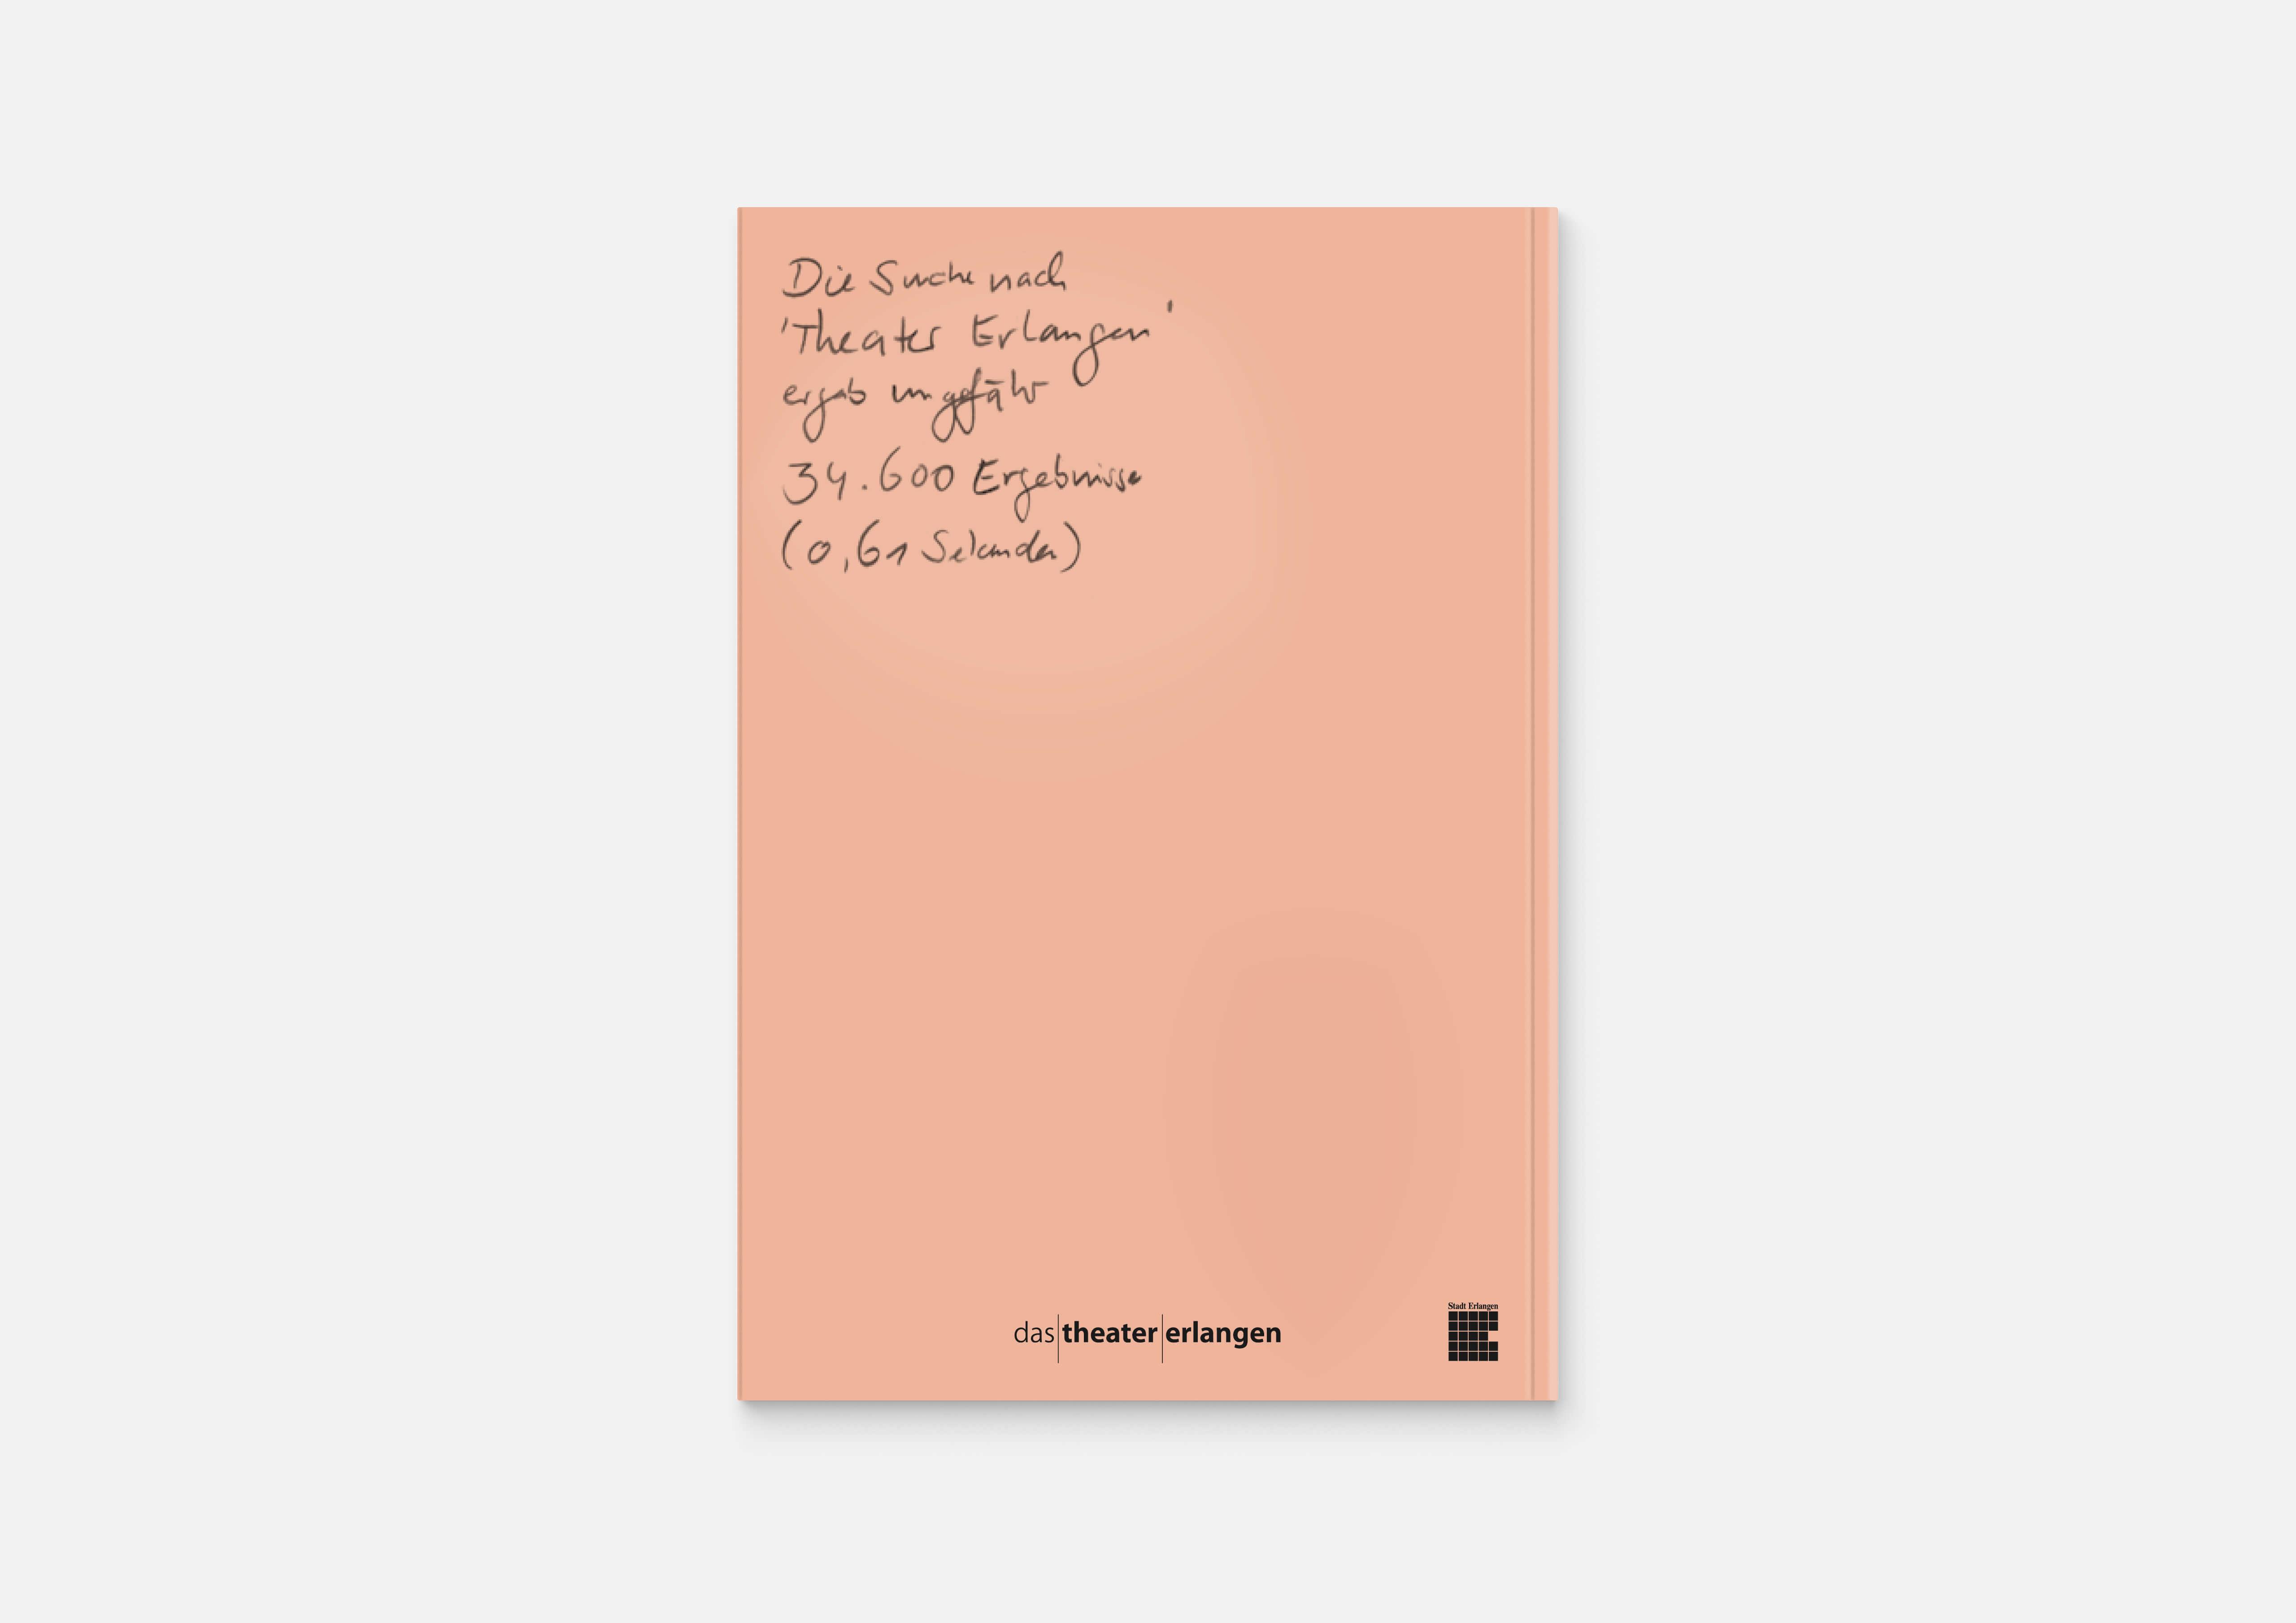 https://neuegestaltung.de/media/pages/clients/theater-erlangen-seasonal-program-2021-22/8998a2eb8b-1630497301/te-szh-202122_01_cover-back.jpg